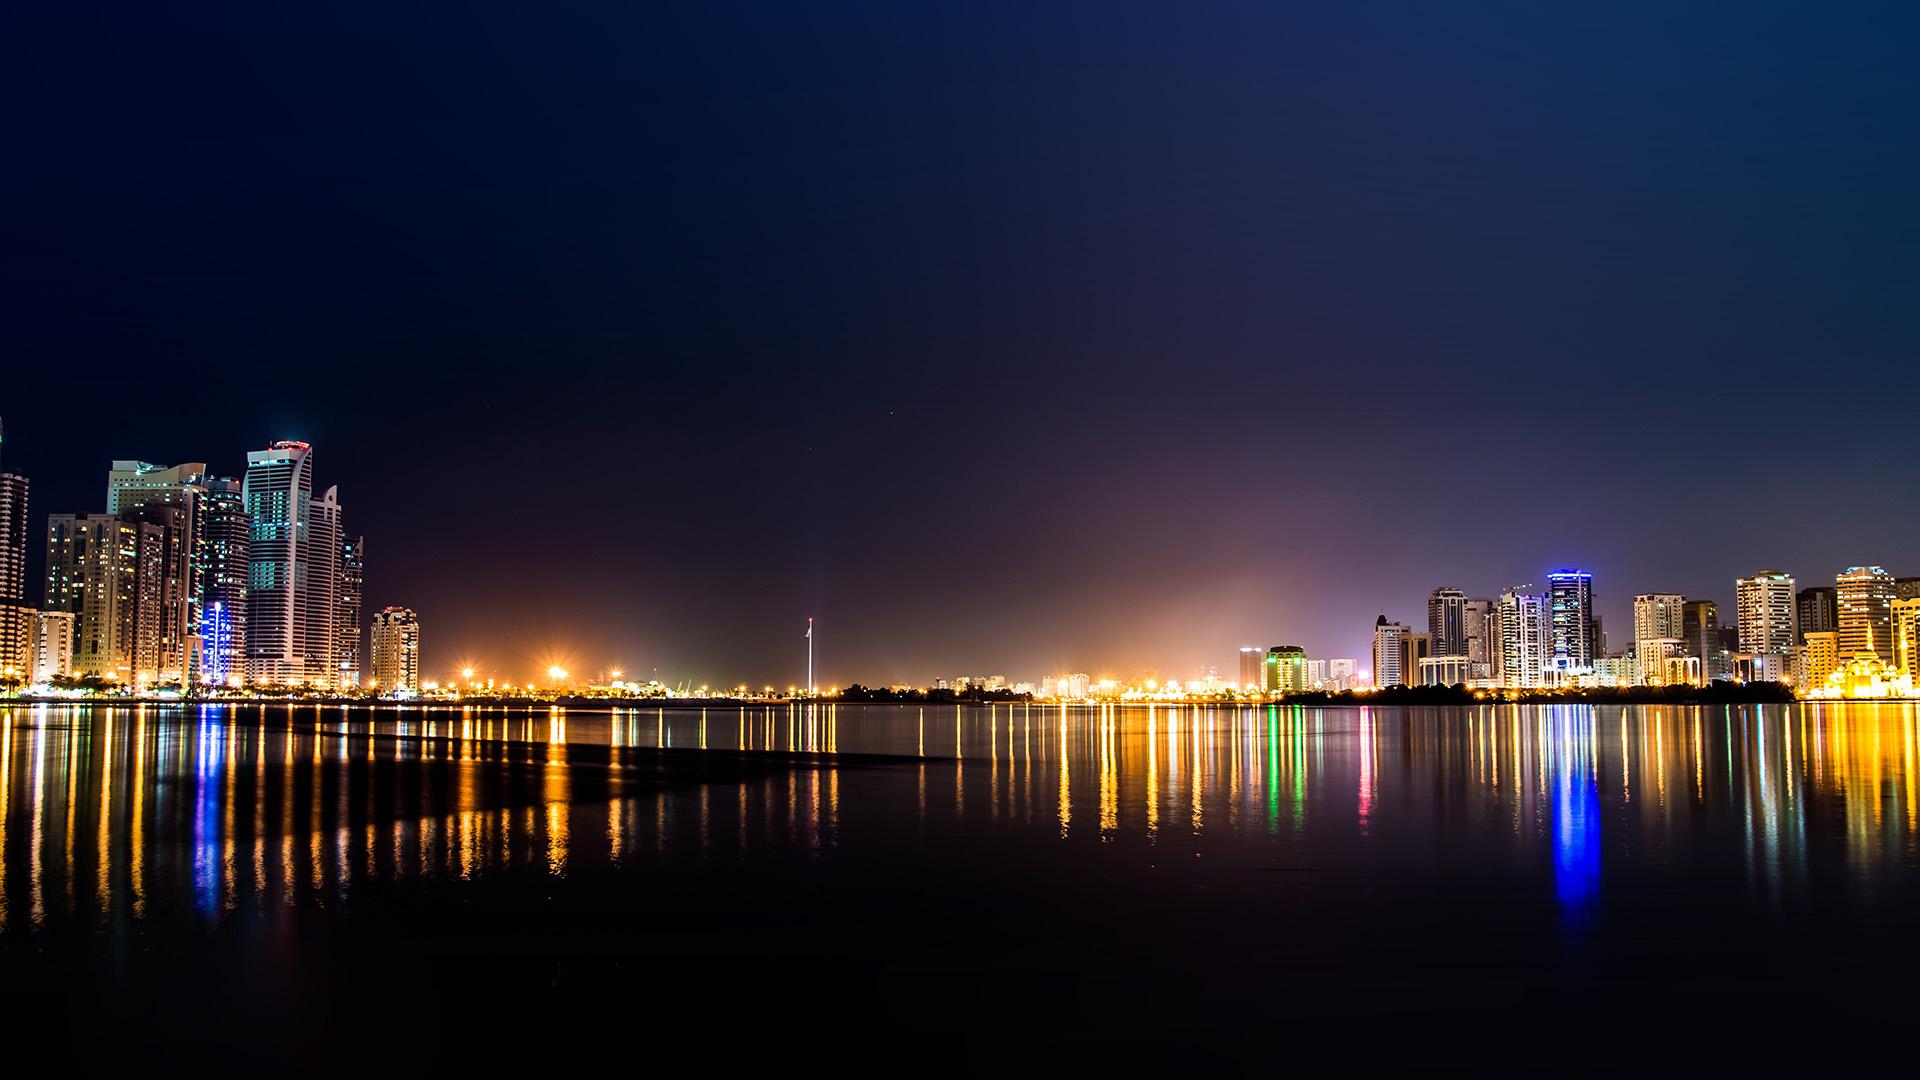 nn03-city-water-river-night-light-bokeh-wallpaper